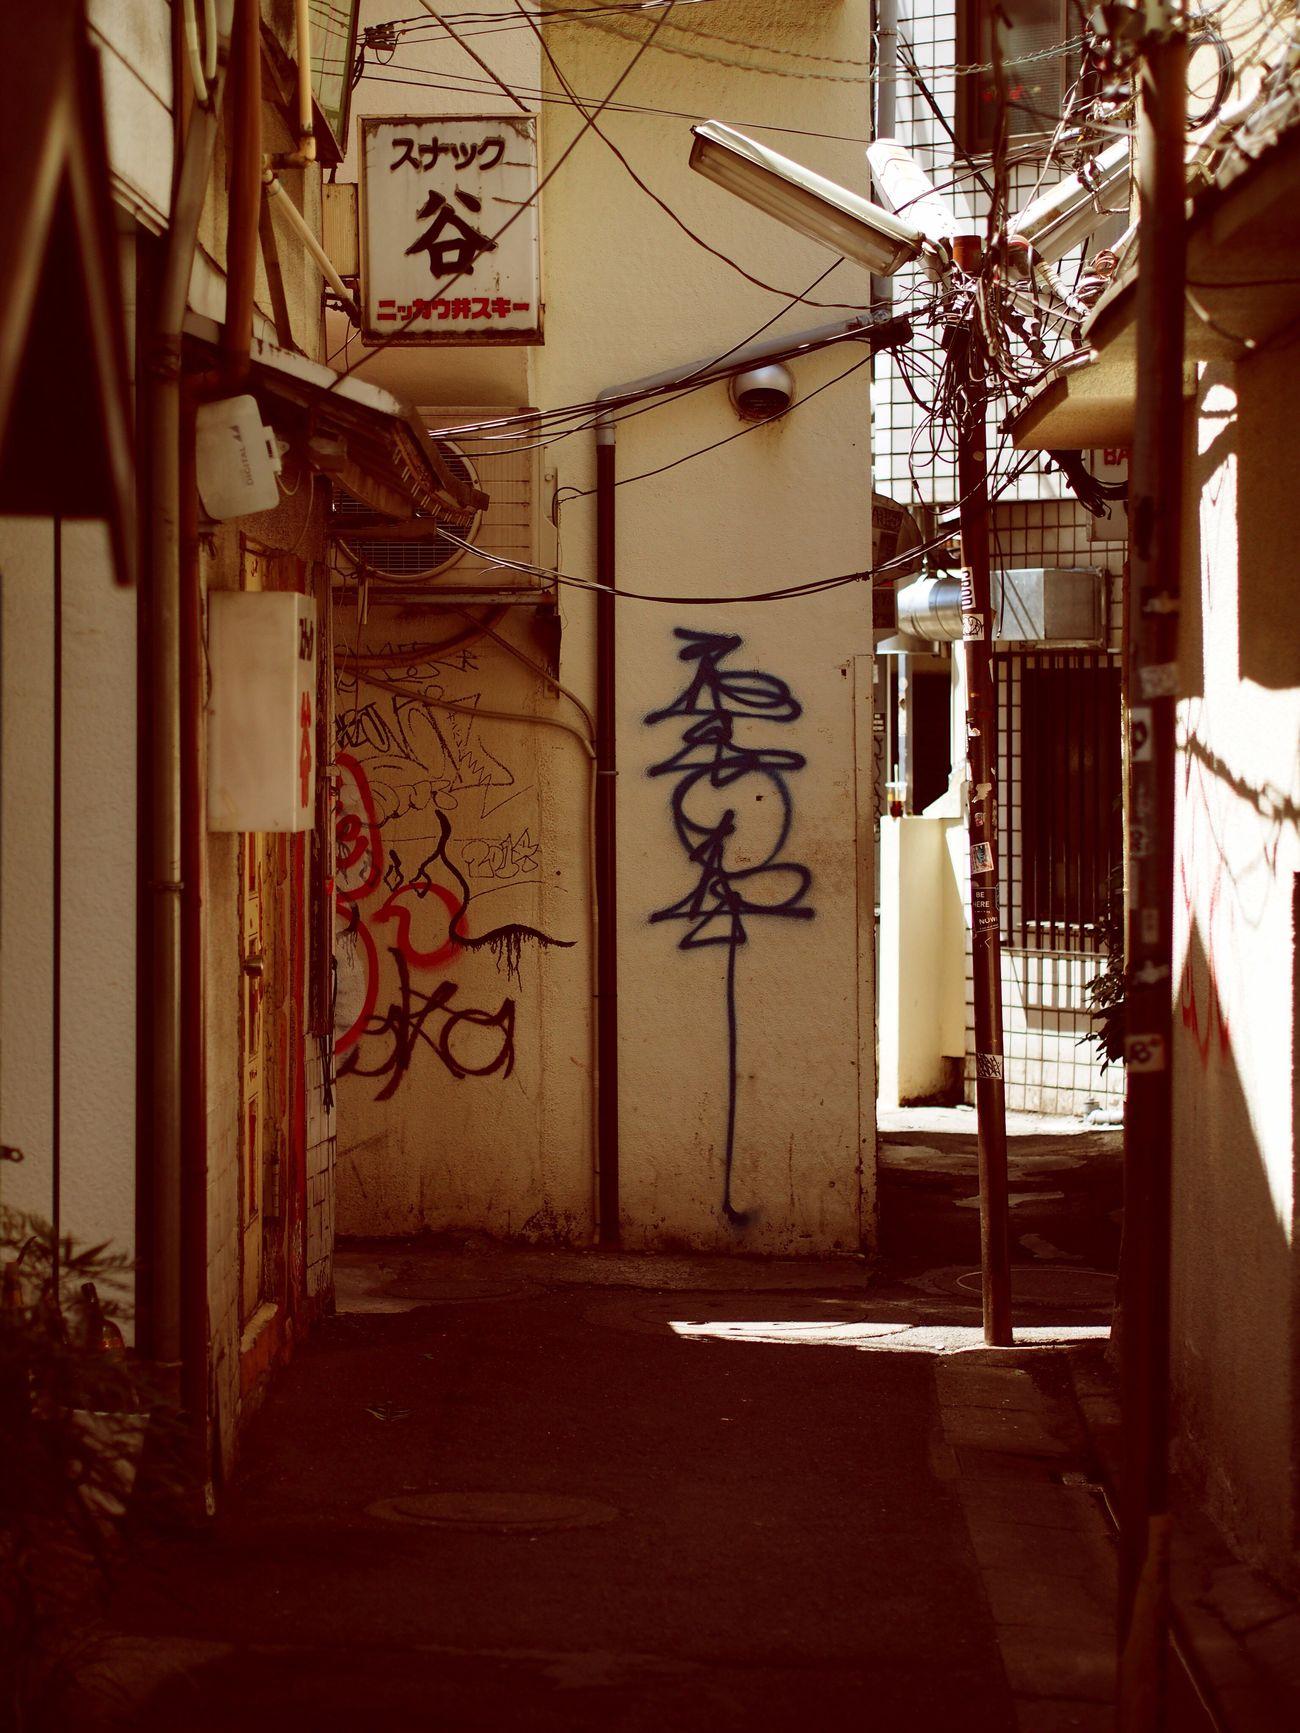 Tokyo Graffiti Alley Billboard Japan Photography Tokyo Street Photography Sangenjaya Setagaya Olympus Olympus OM-D E-M5 Street Streetphotography Street Photography